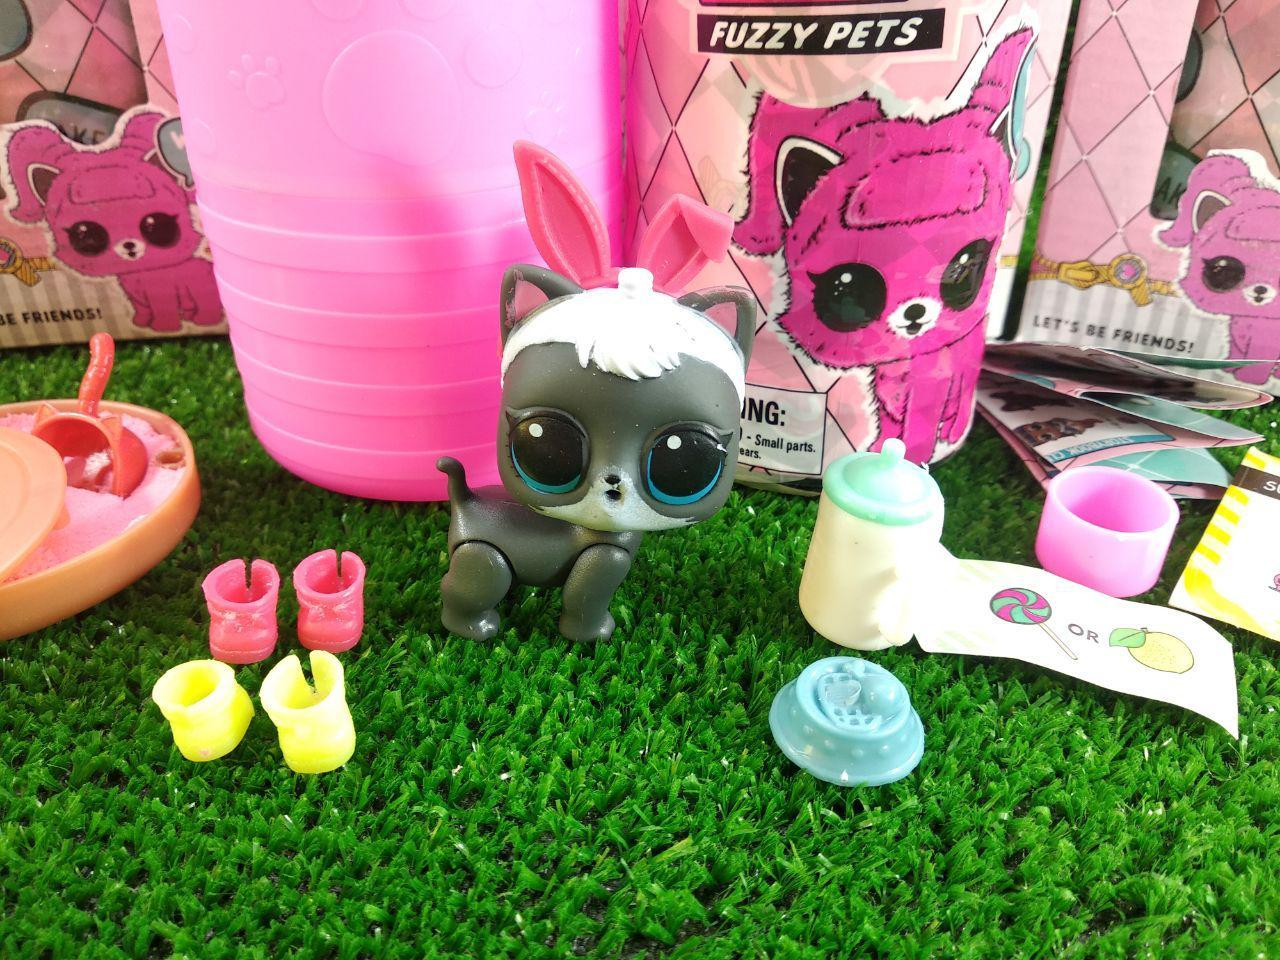 Кукла фуззи петс Fuzzy Pets Питомец с кинетическим песком внутри